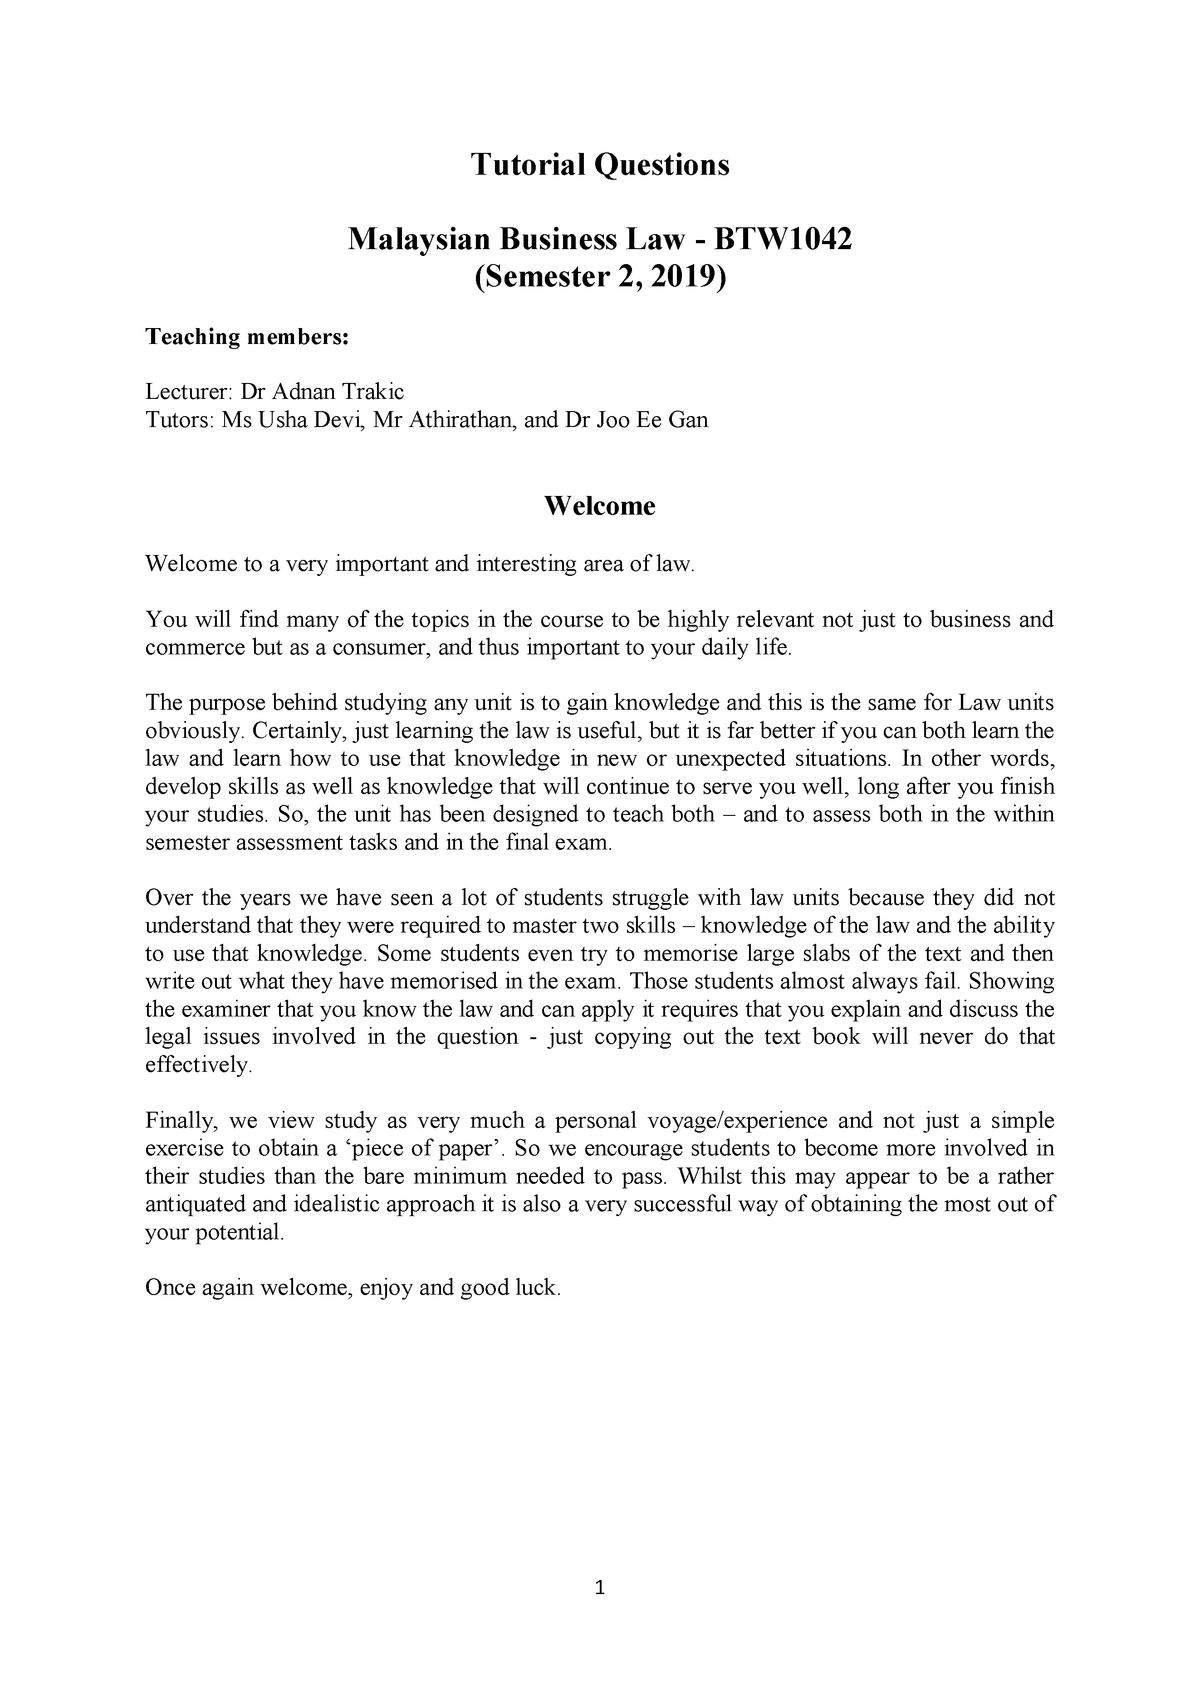 All Tutorial Questions 2019 Semester 2 - BTW1042 - Monash